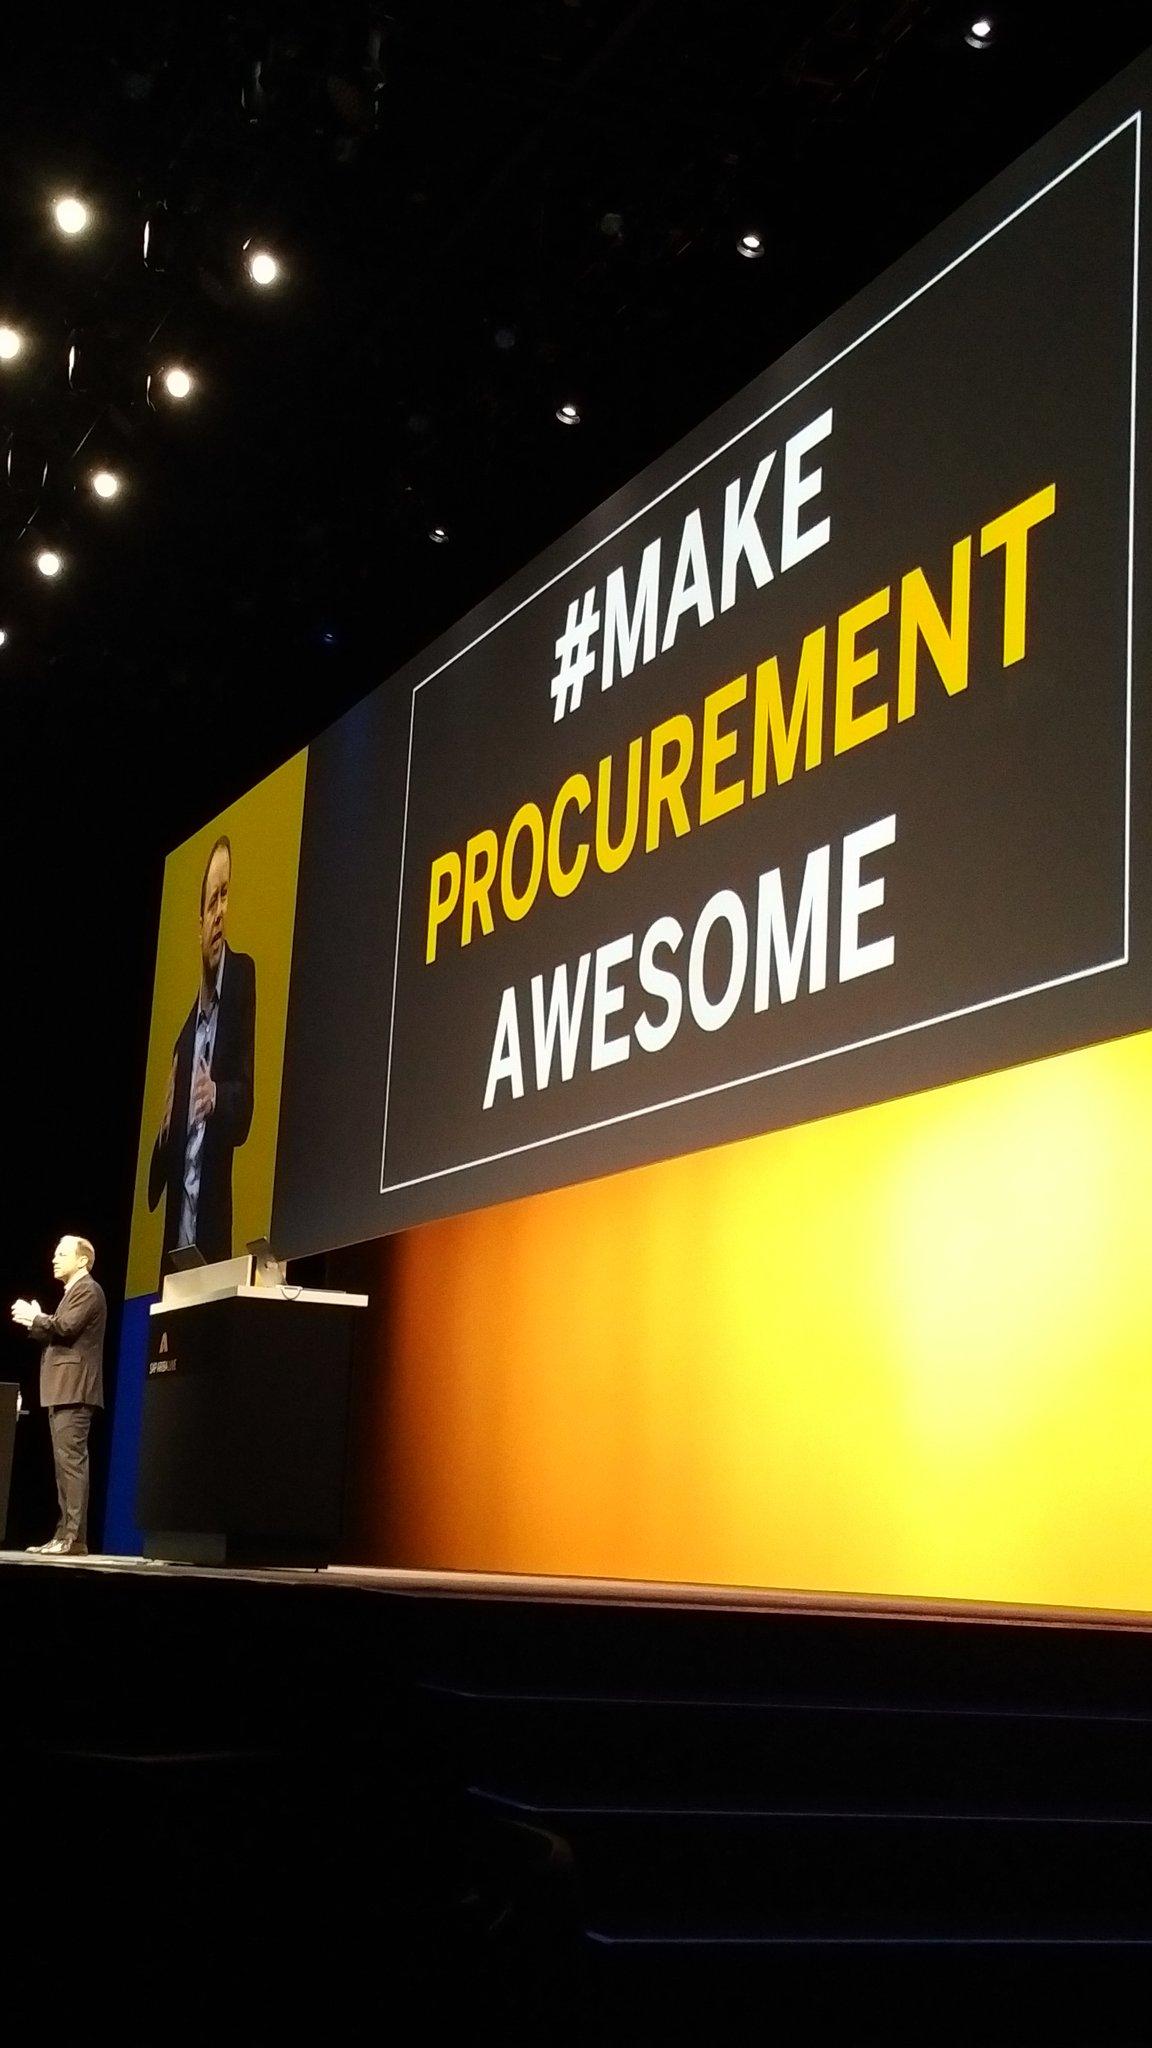 And @aatzberger unveils @SAPAriba tagline  #MakeProcurementAwesome #SAPARIBALIVE https://t.co/GpMaiB6PO8